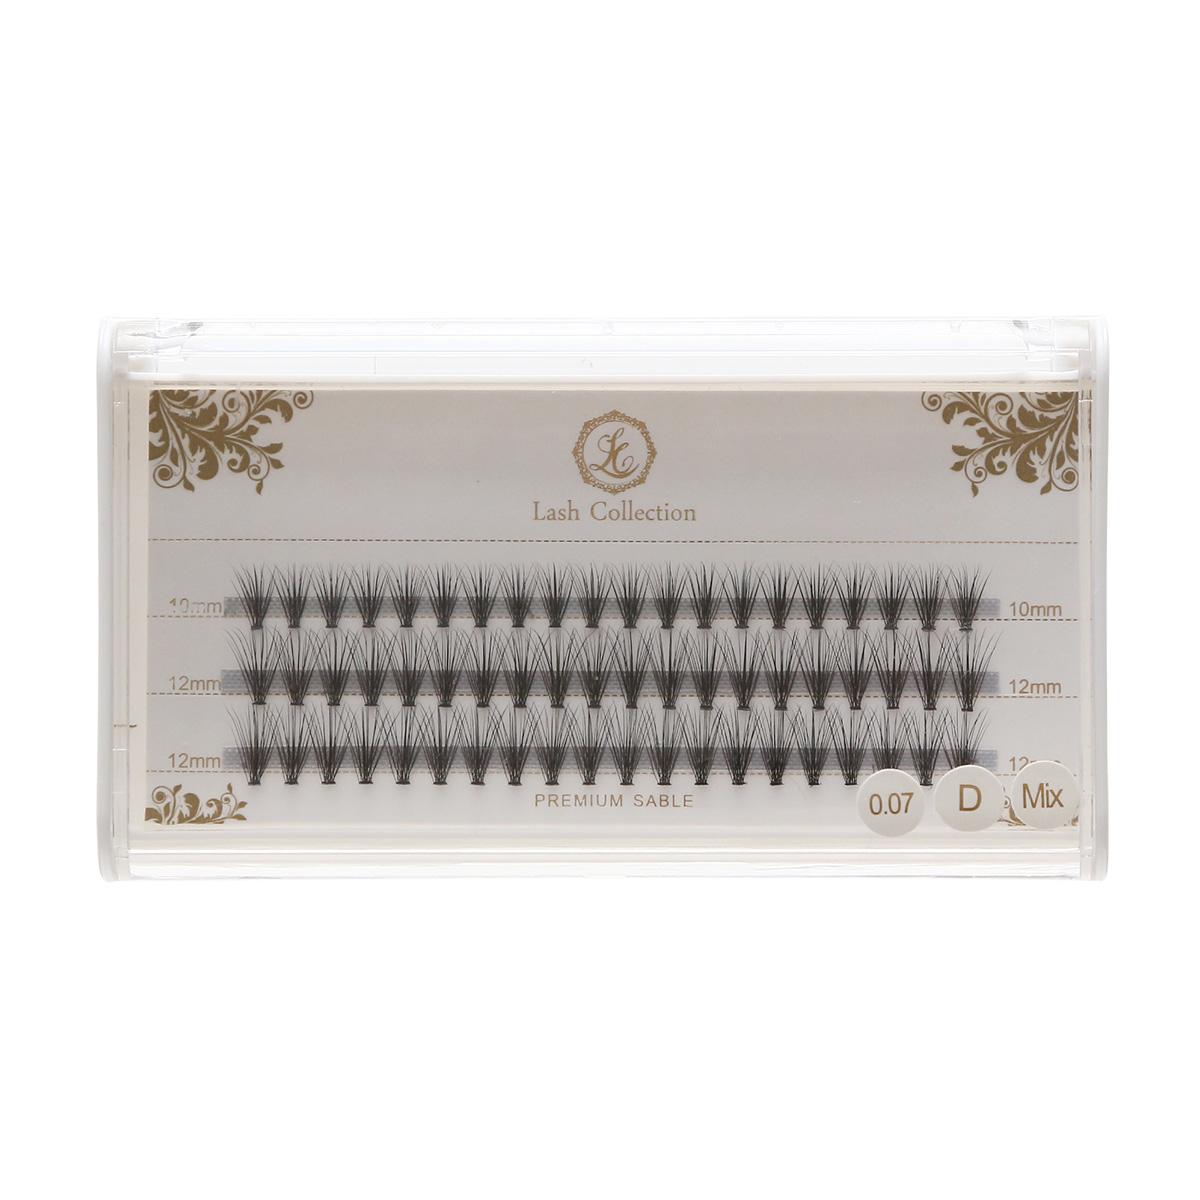 Premium Mink Eyelash Extension 20 Flare Lashes - J Curl